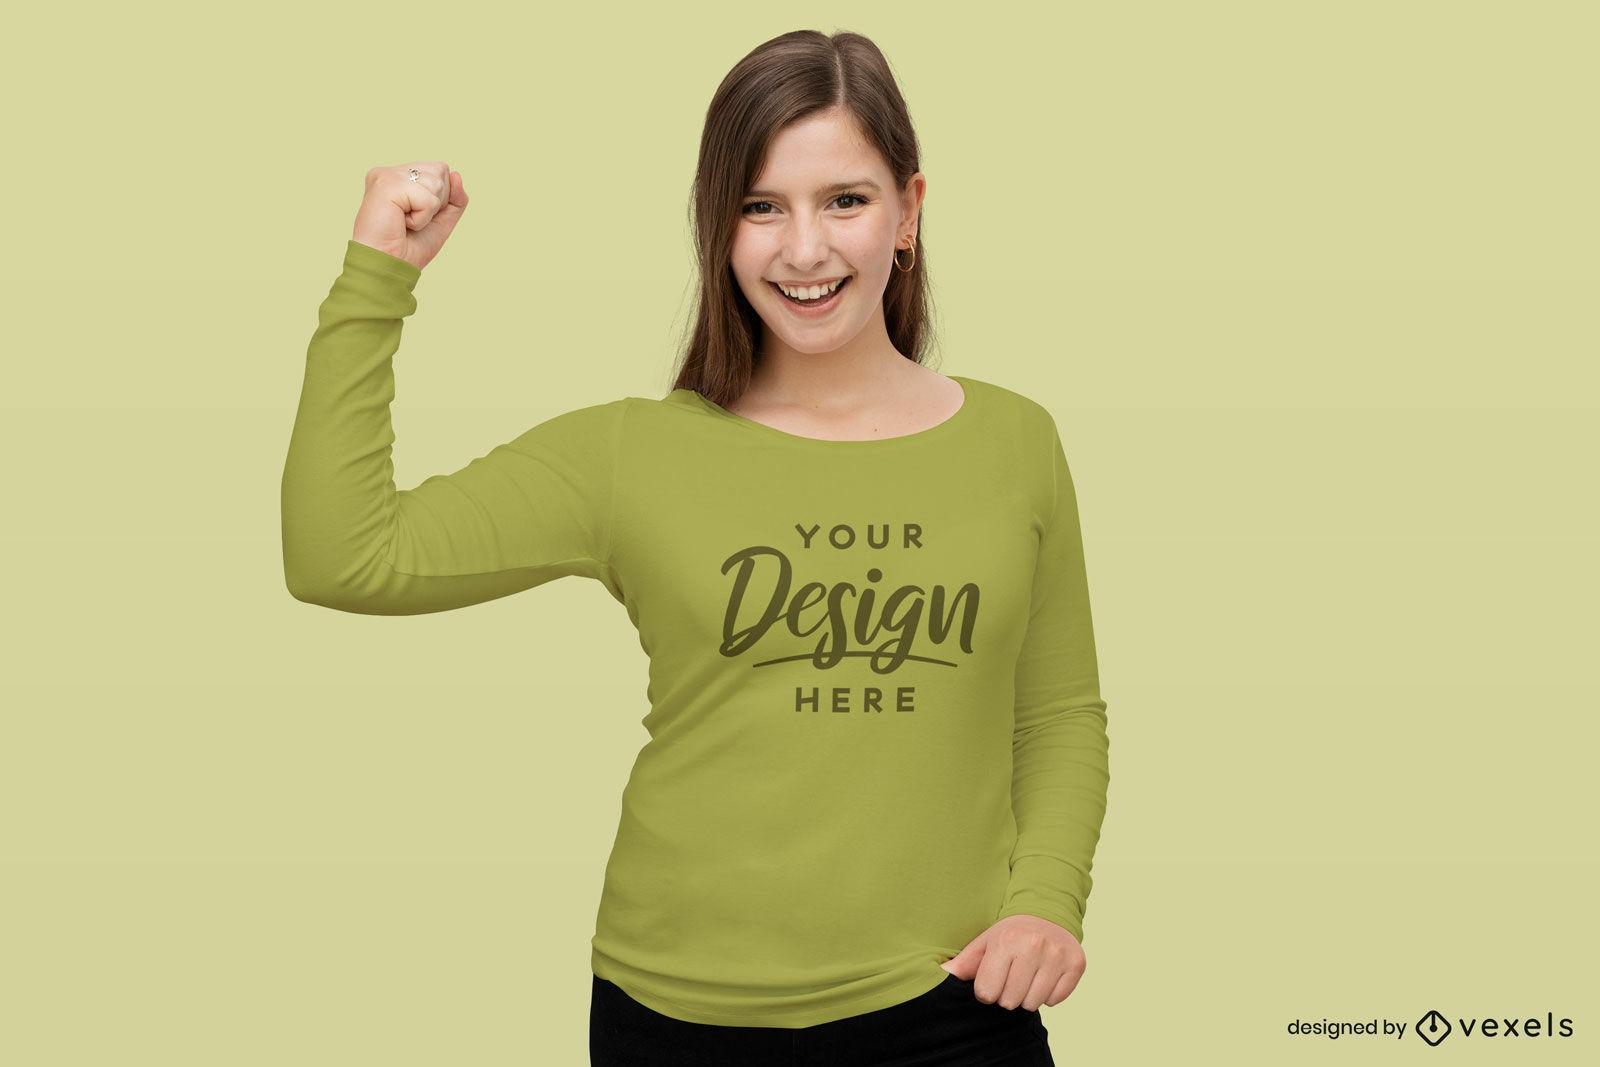 Maqueta de camisa de manga larga de mujer feliz